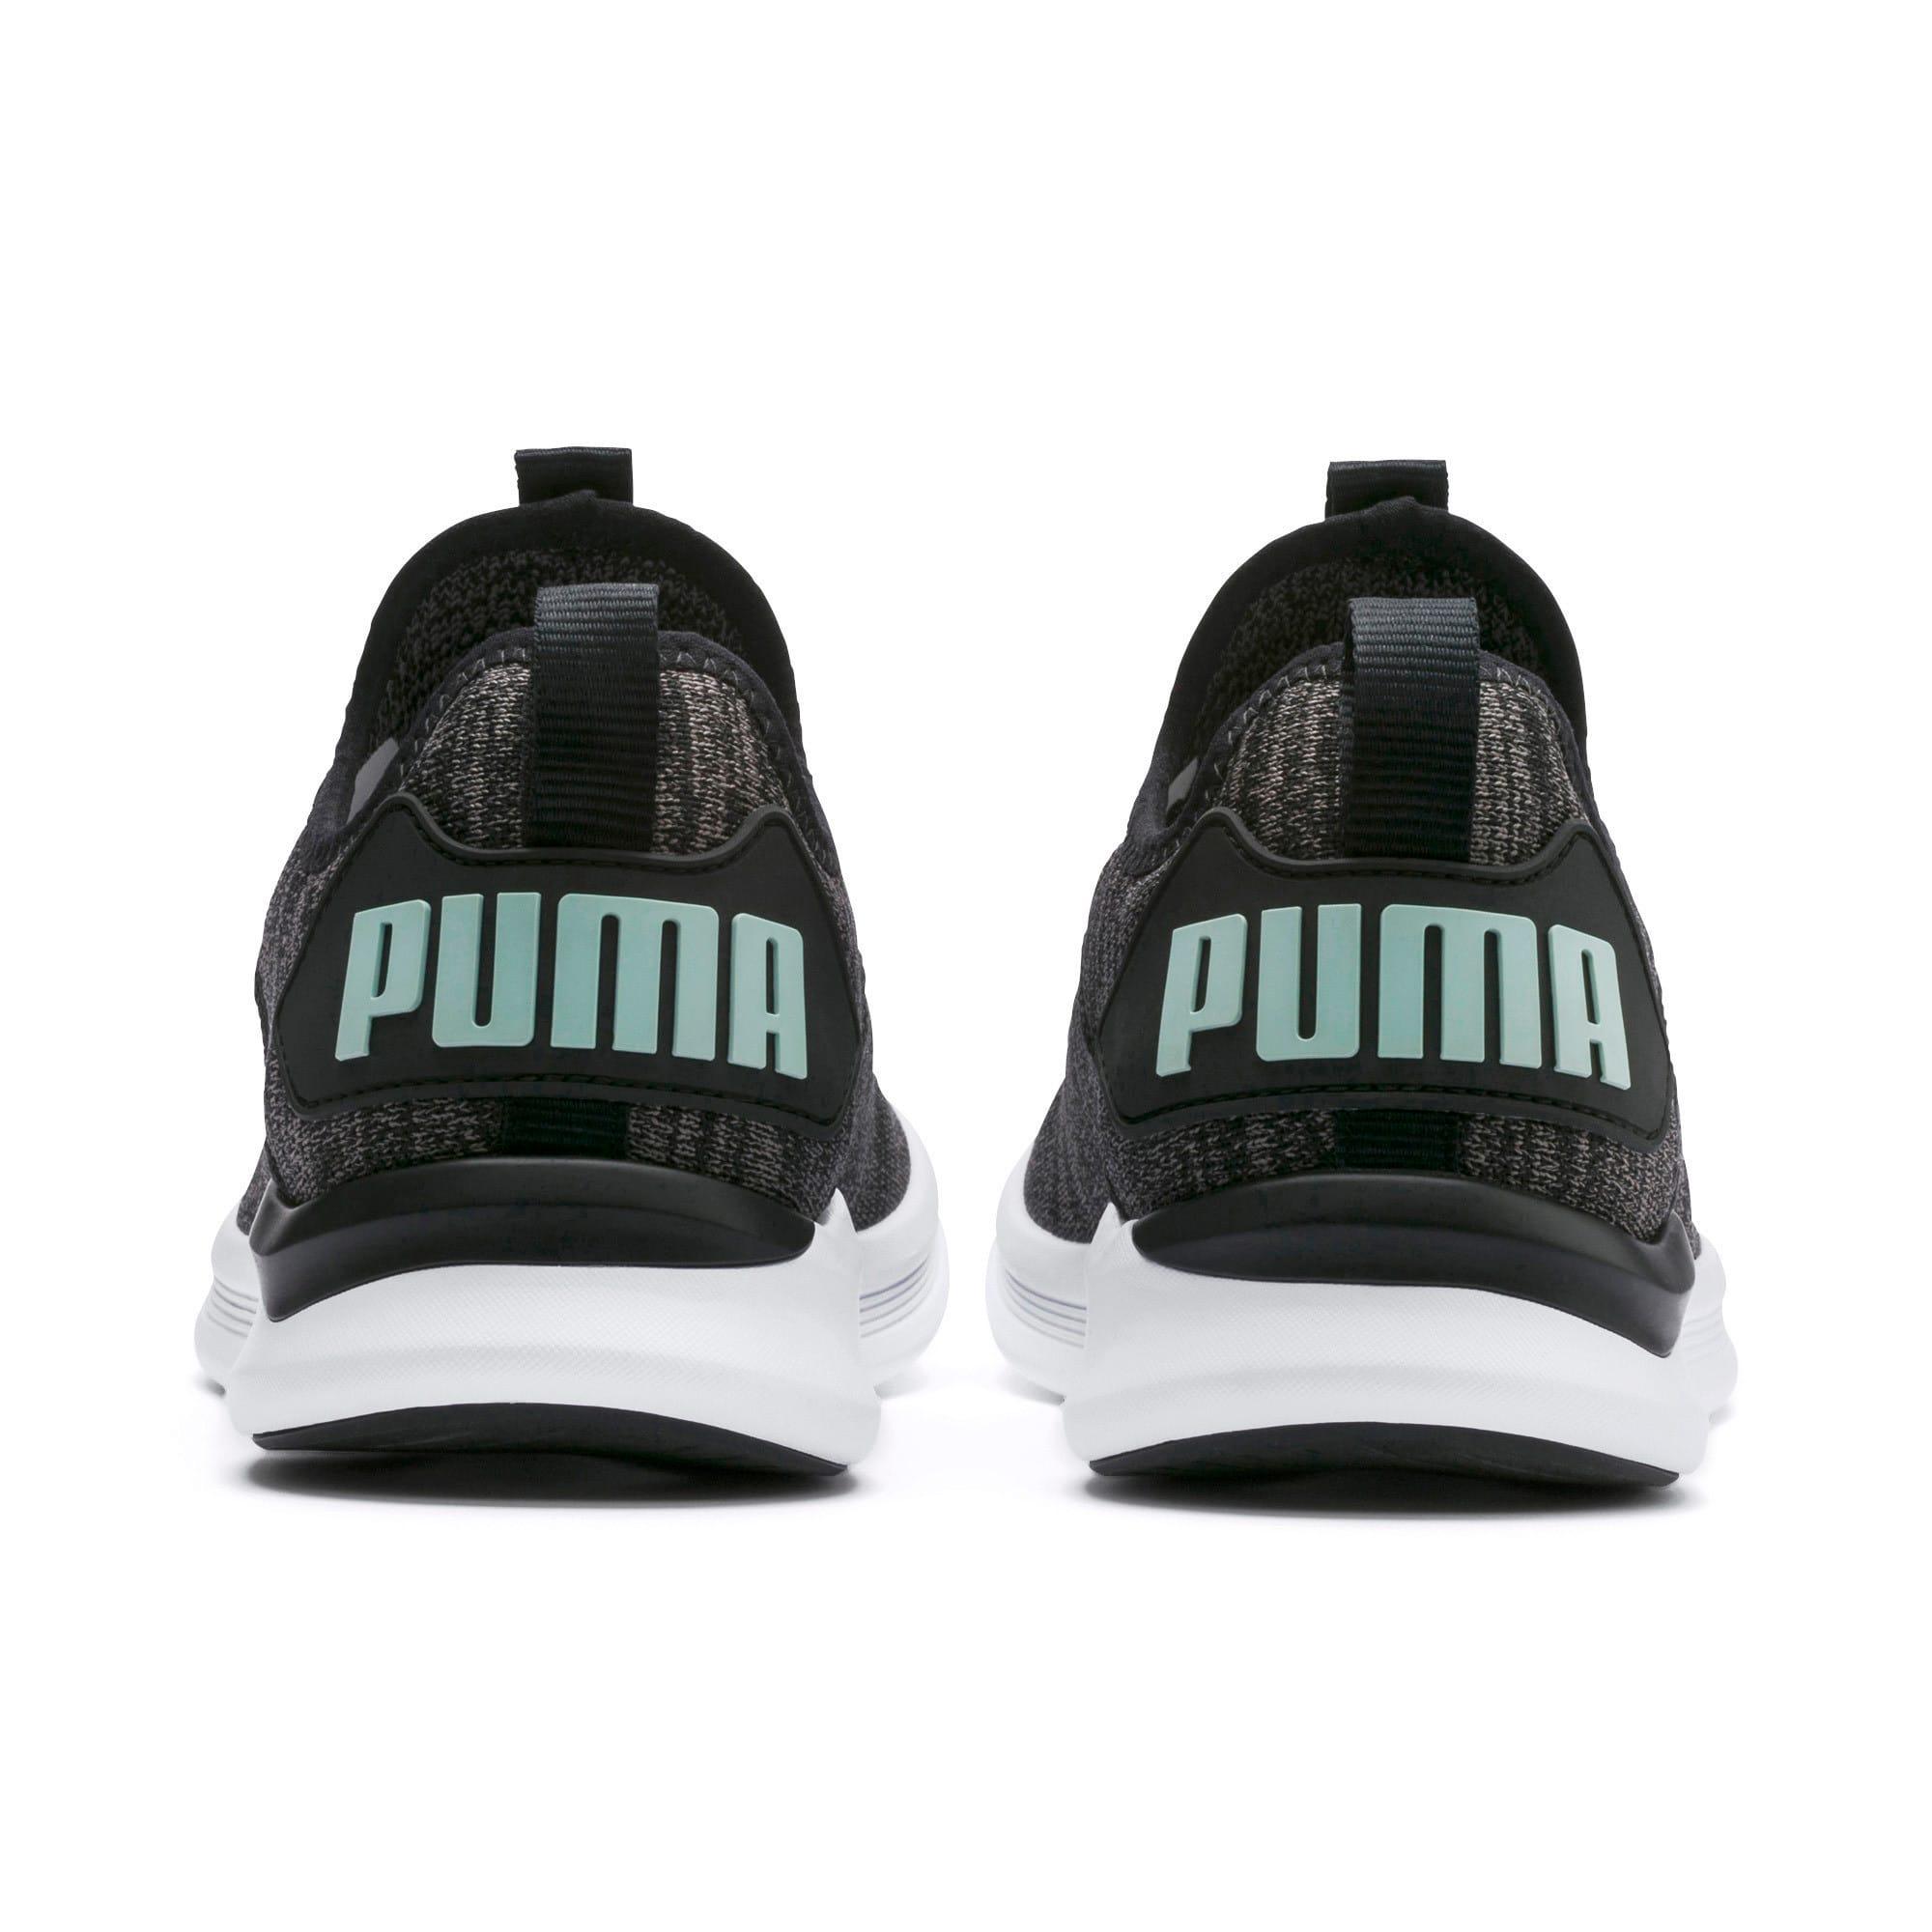 Thumbnail 4 of IGNITE Flash evoKNIT Women's Running Shoes, Black-Charcoal-Fair Aqua, medium-IND